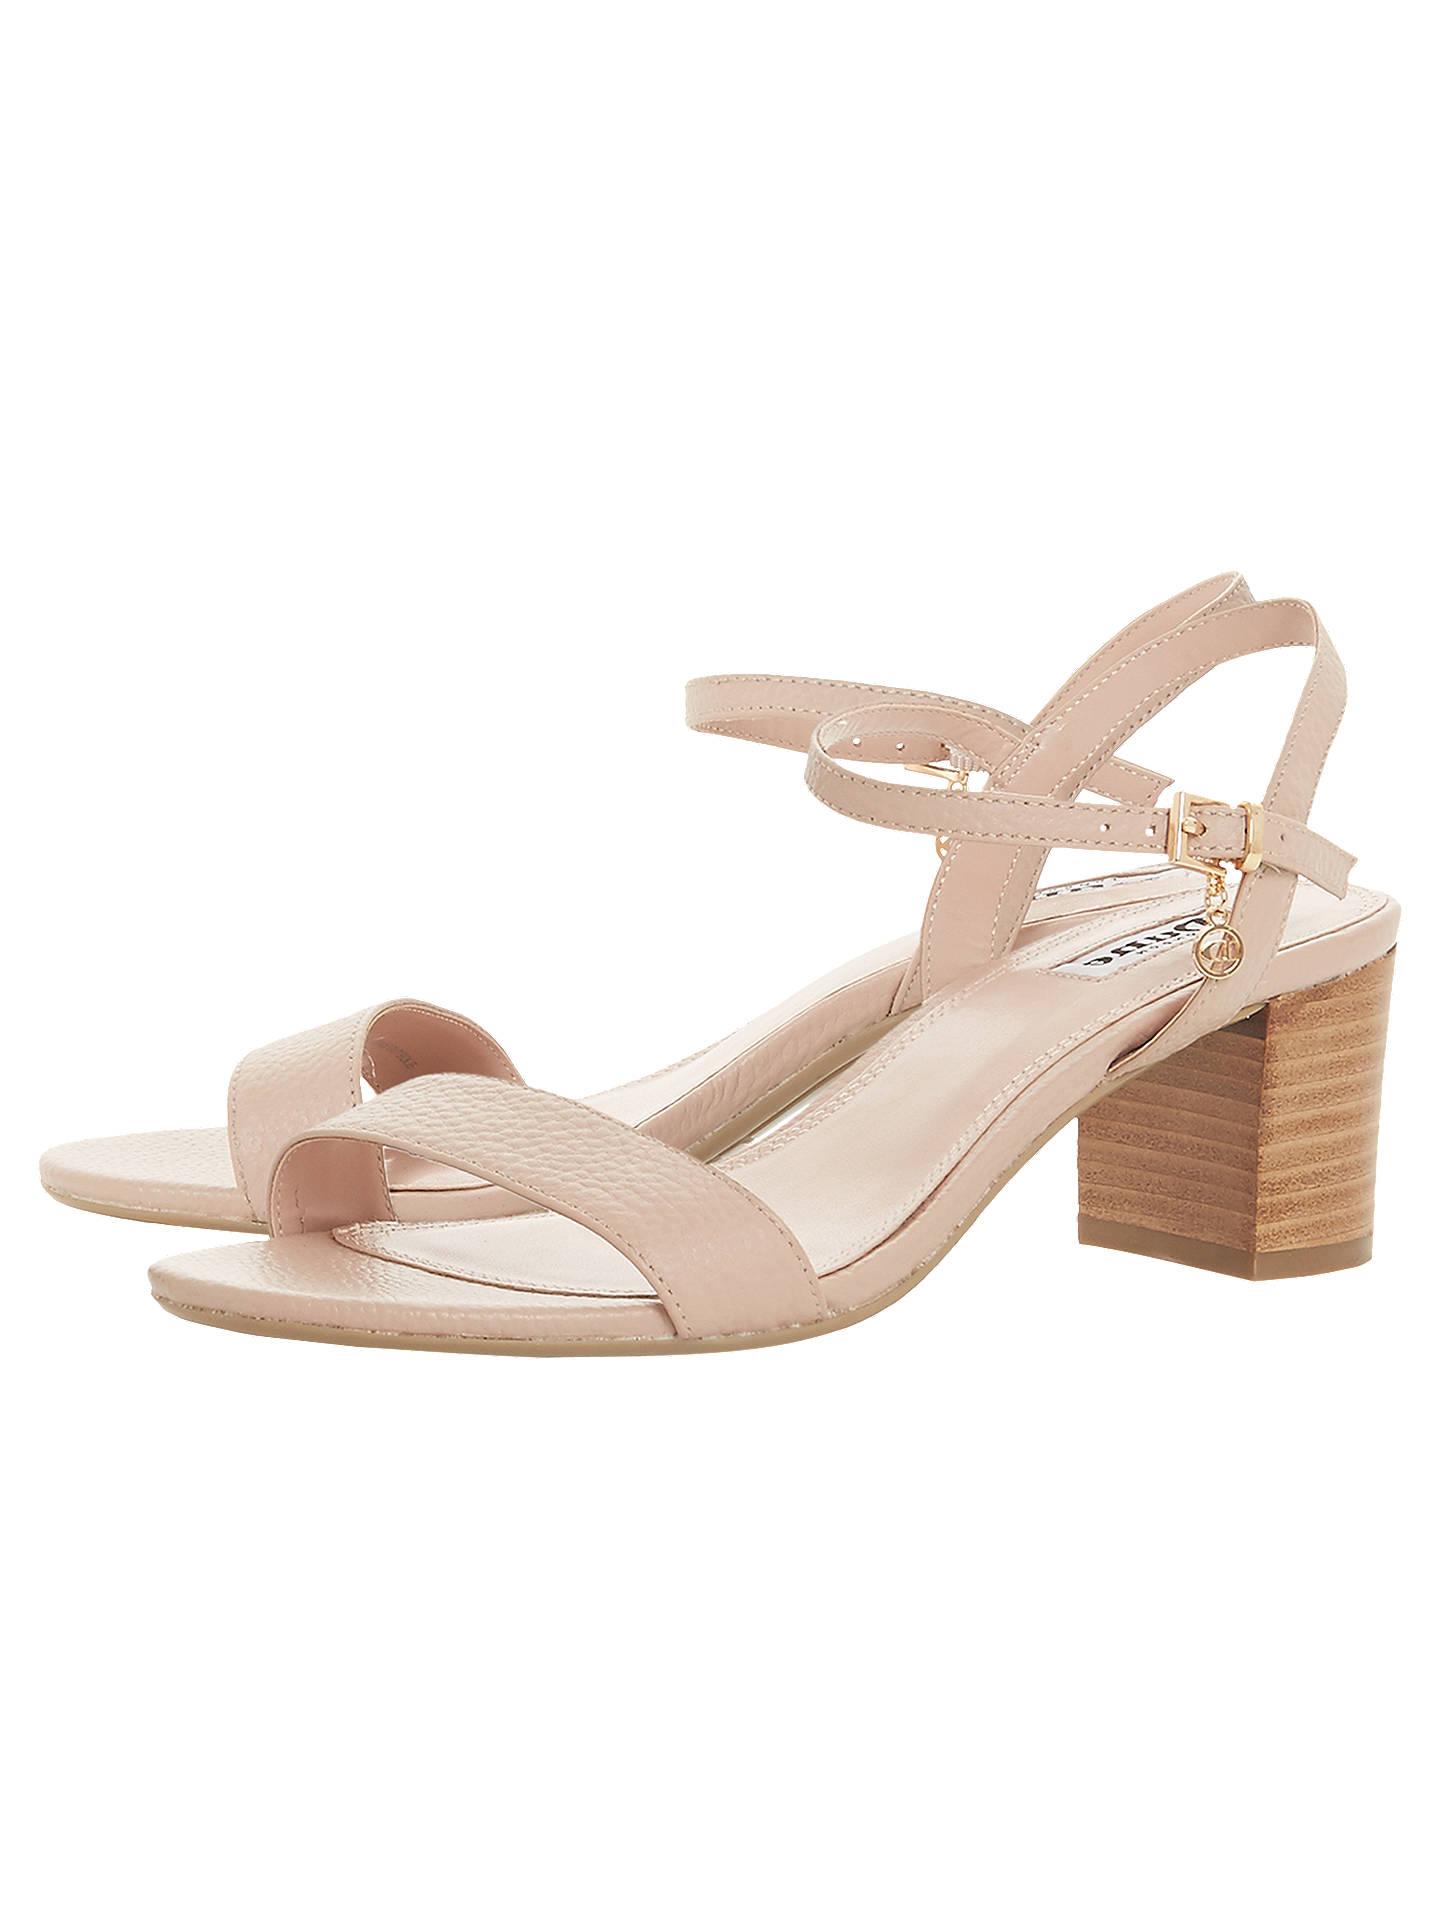 96a0b1e0877 Dune Jiggle Block Heel Sandals at John Lewis   Partners